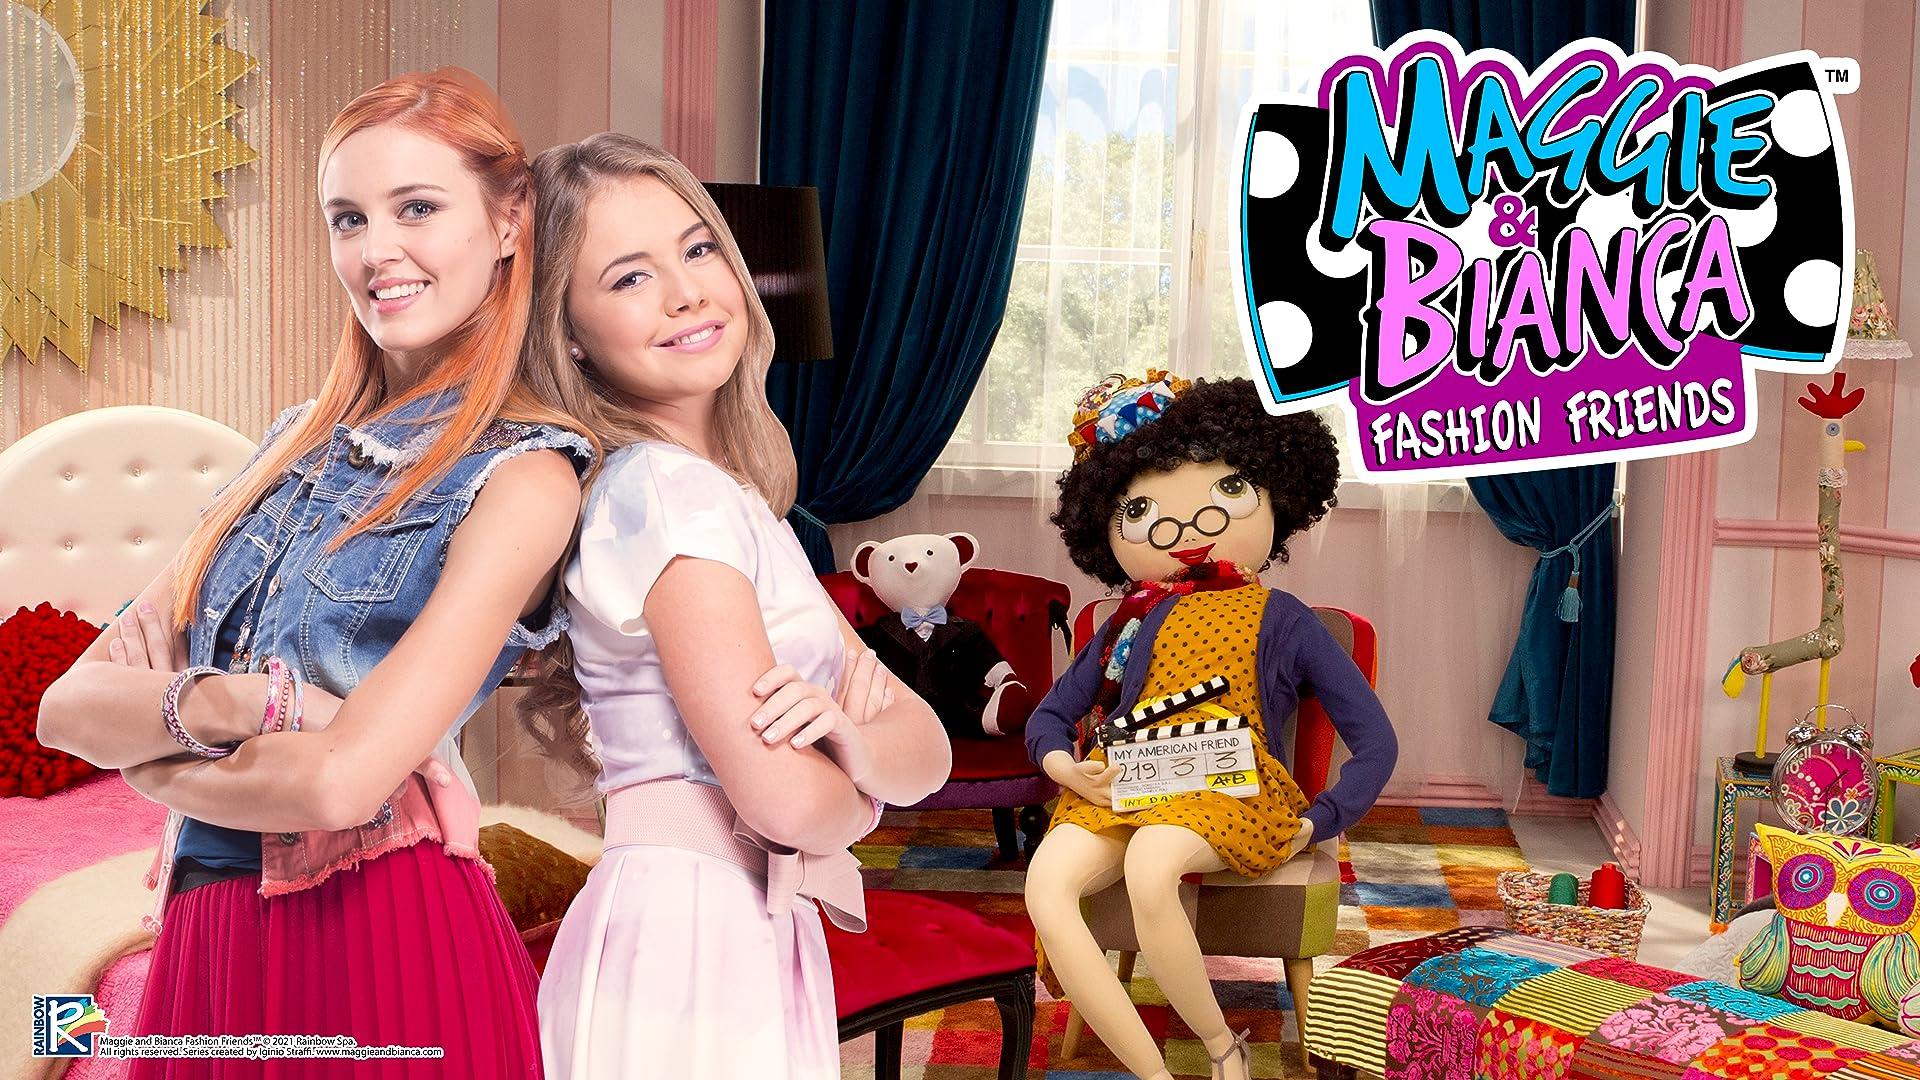 Maggie & Bianca - Fashion Friends DE